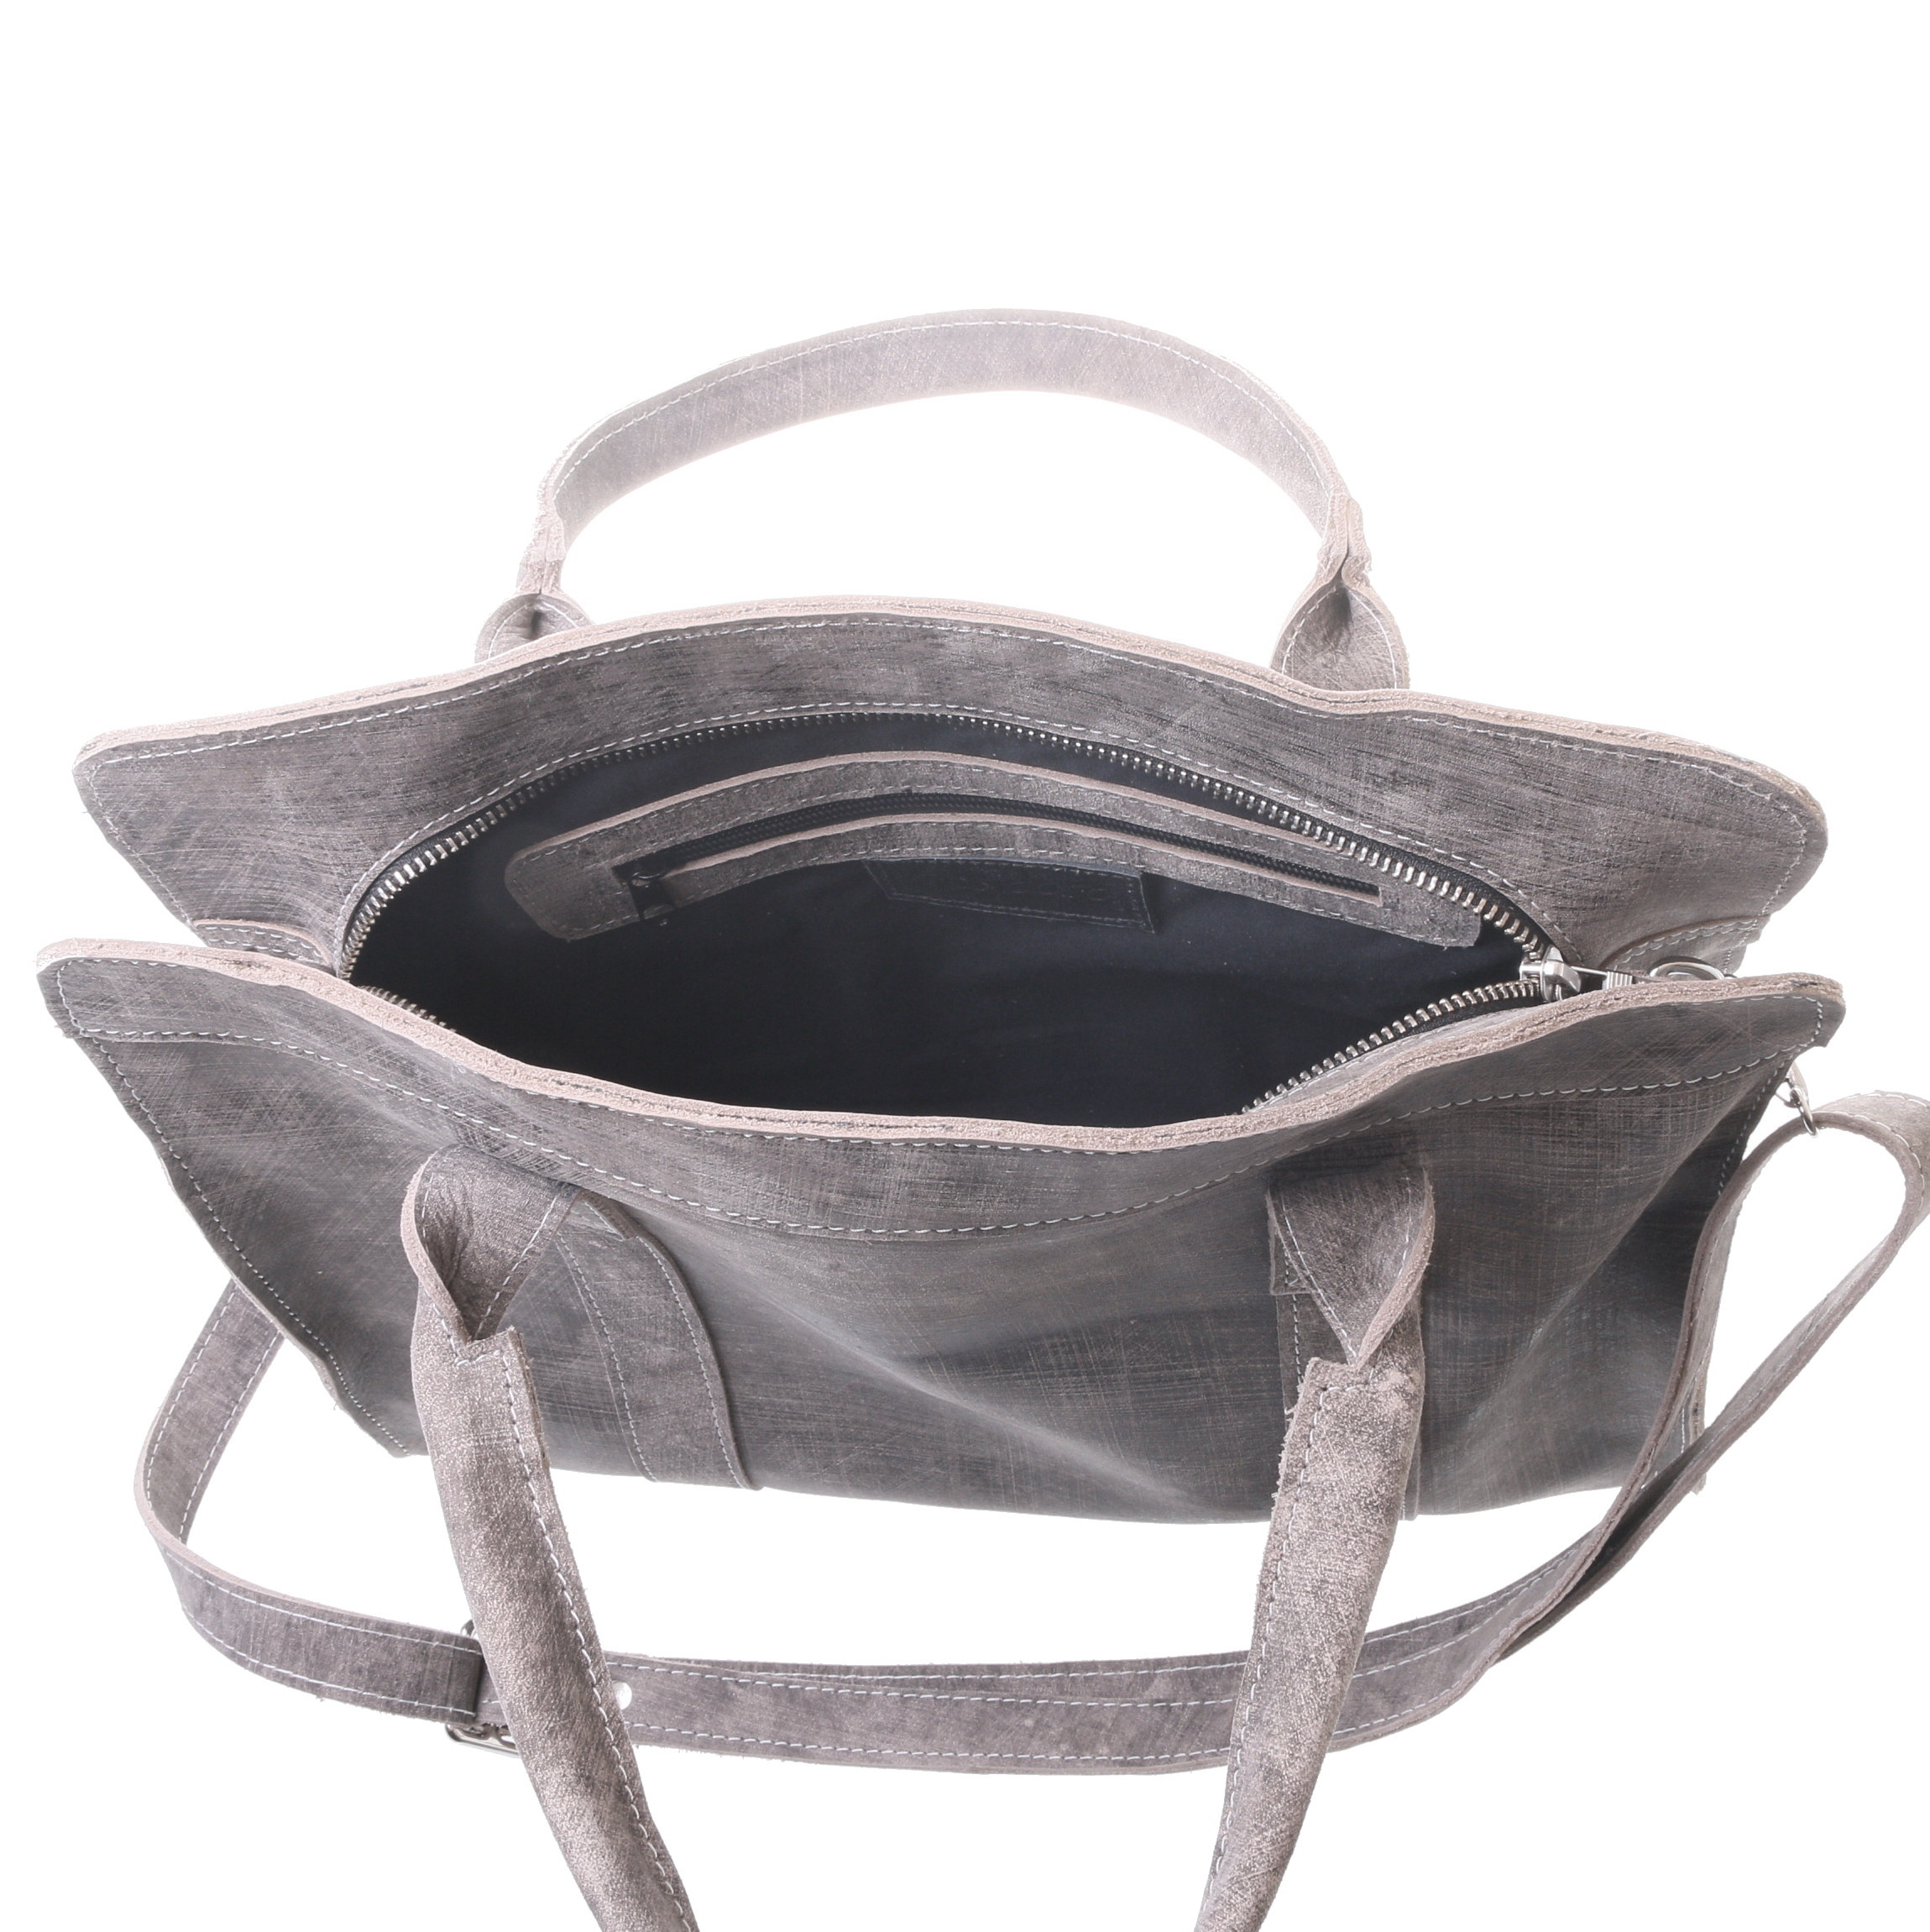 Gundara - fair genuine leather handbag - grey-scratch - handmade in Ethiopia